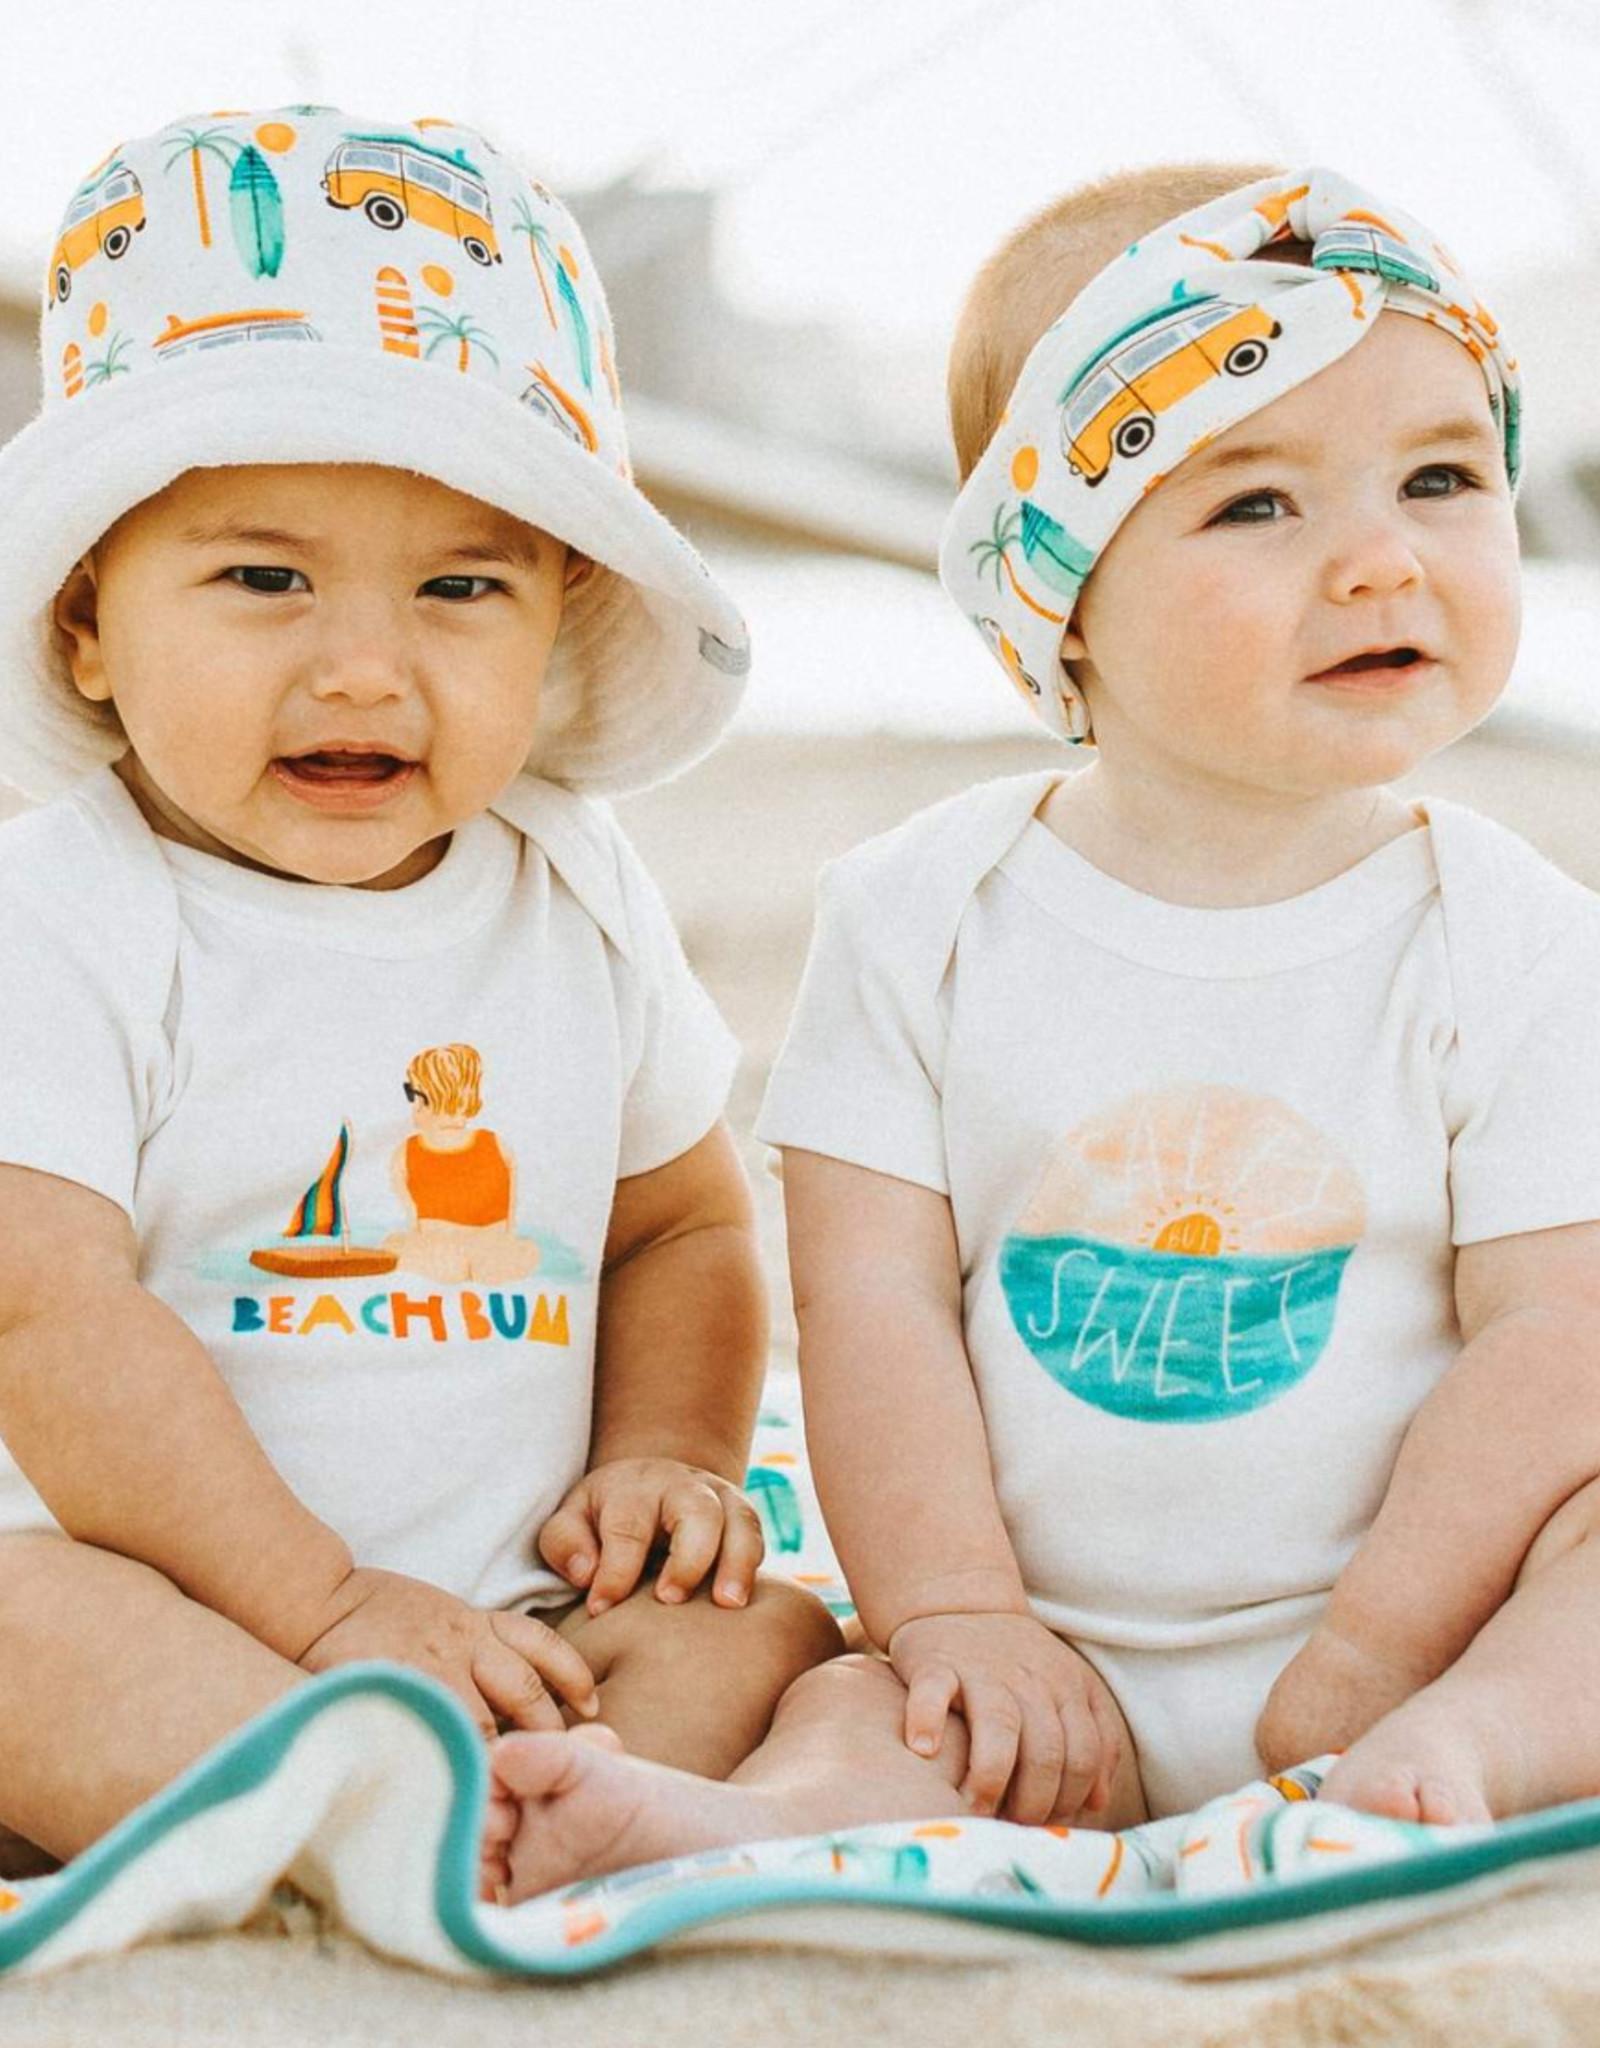 Finn and emma Beach Bum Onesie